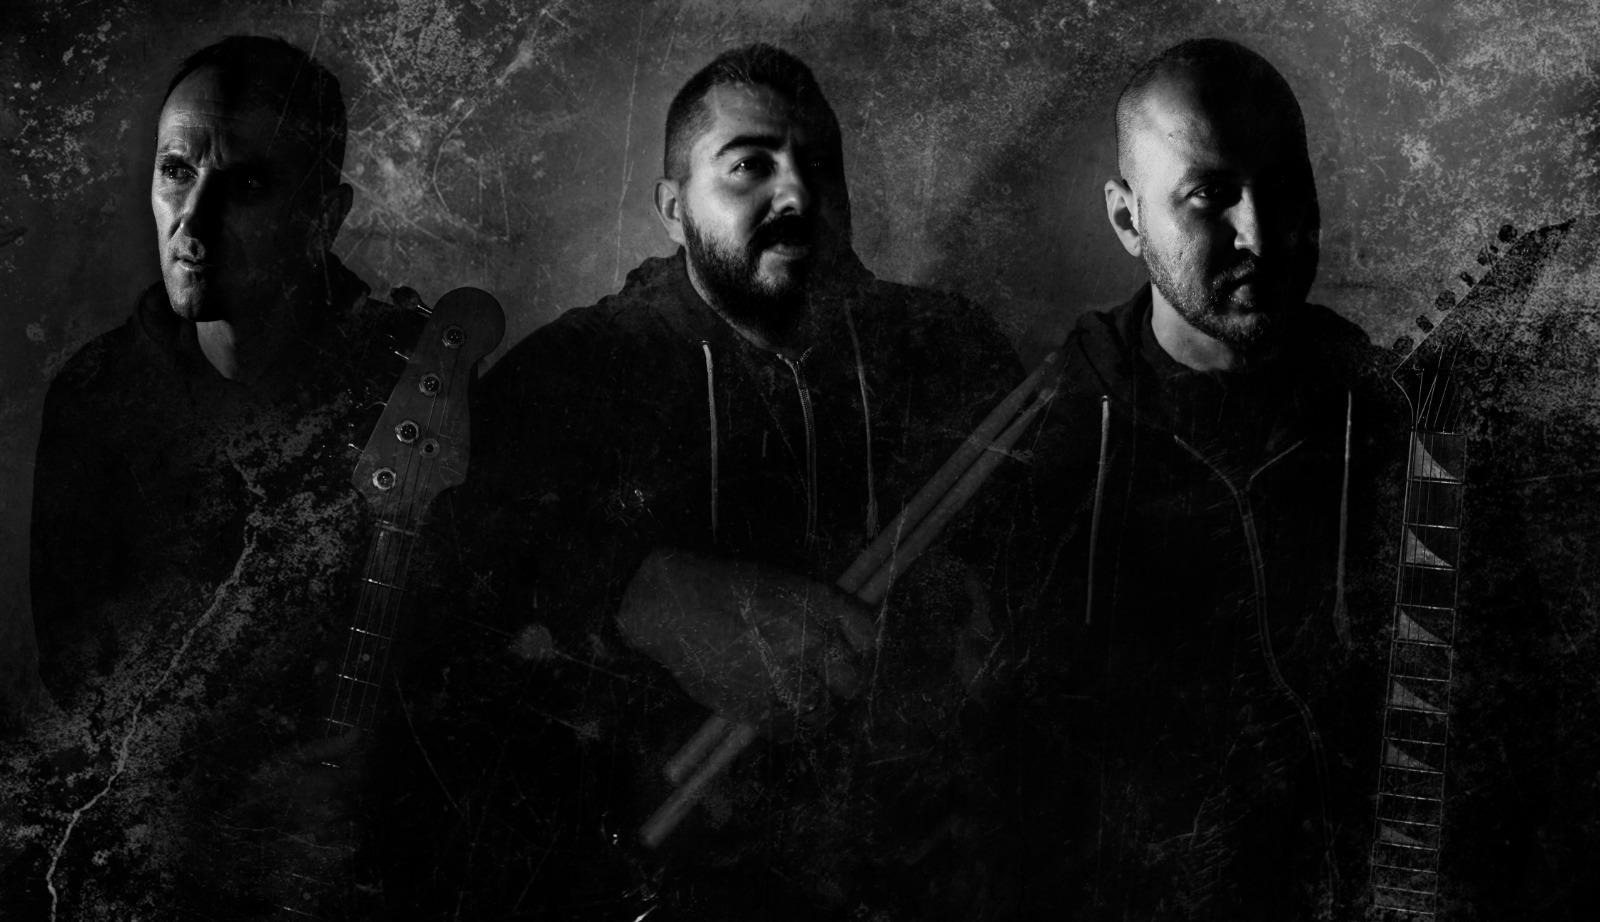 La banda lagunera Psyque se estrena en el  Aguere Cultural junto a Angelus Apatrida